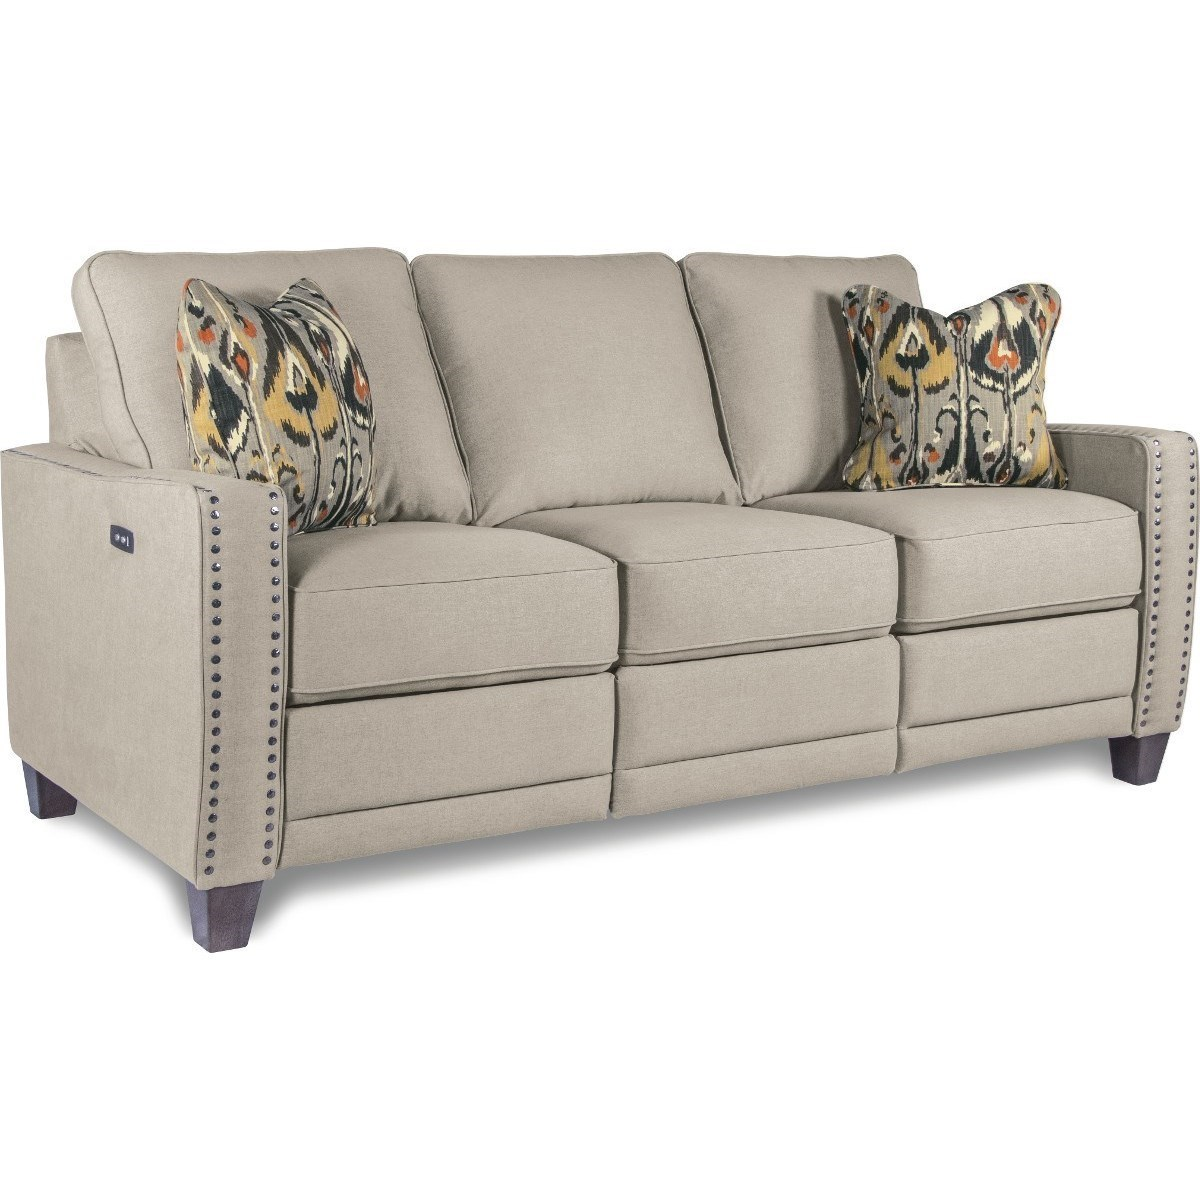 reclining sofa with nailhead trim custom sectional canada la z boy makenna duo power usb charging ports makennaduo shown optional nailheads